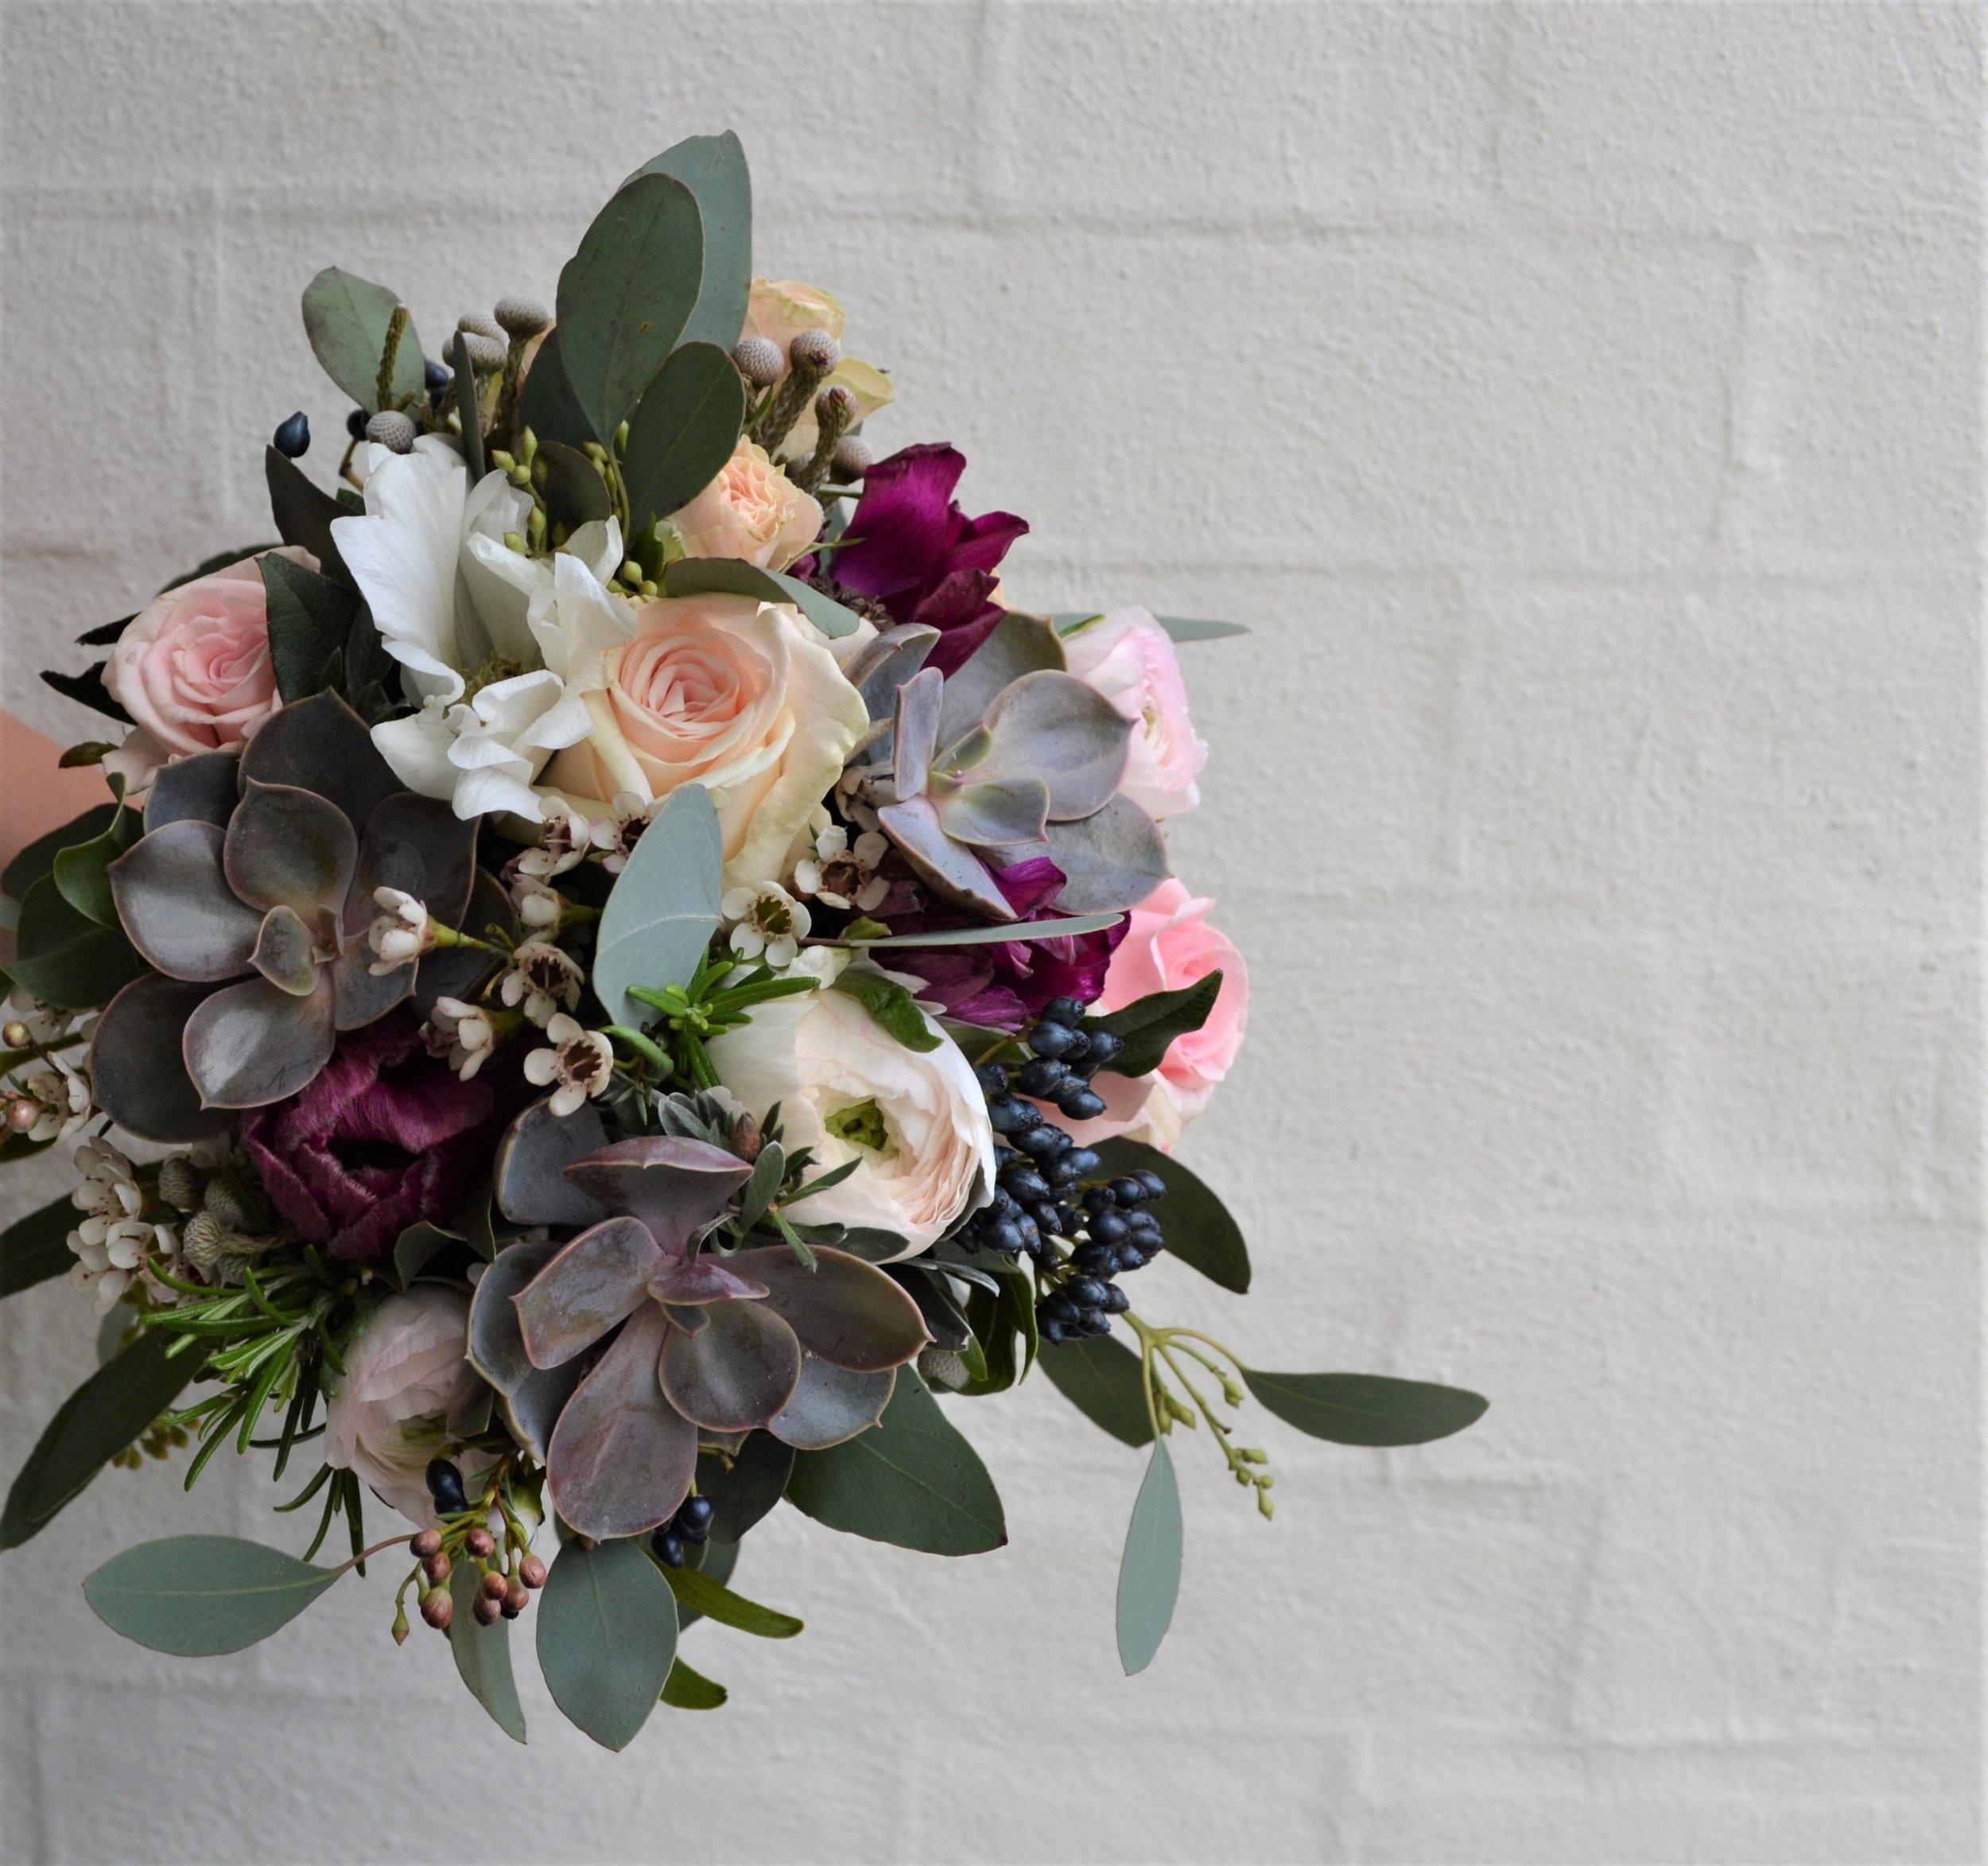 Webb-and-Farrer-Florist-Brighton-Sussex-Wedding-Flowers (4).JPG